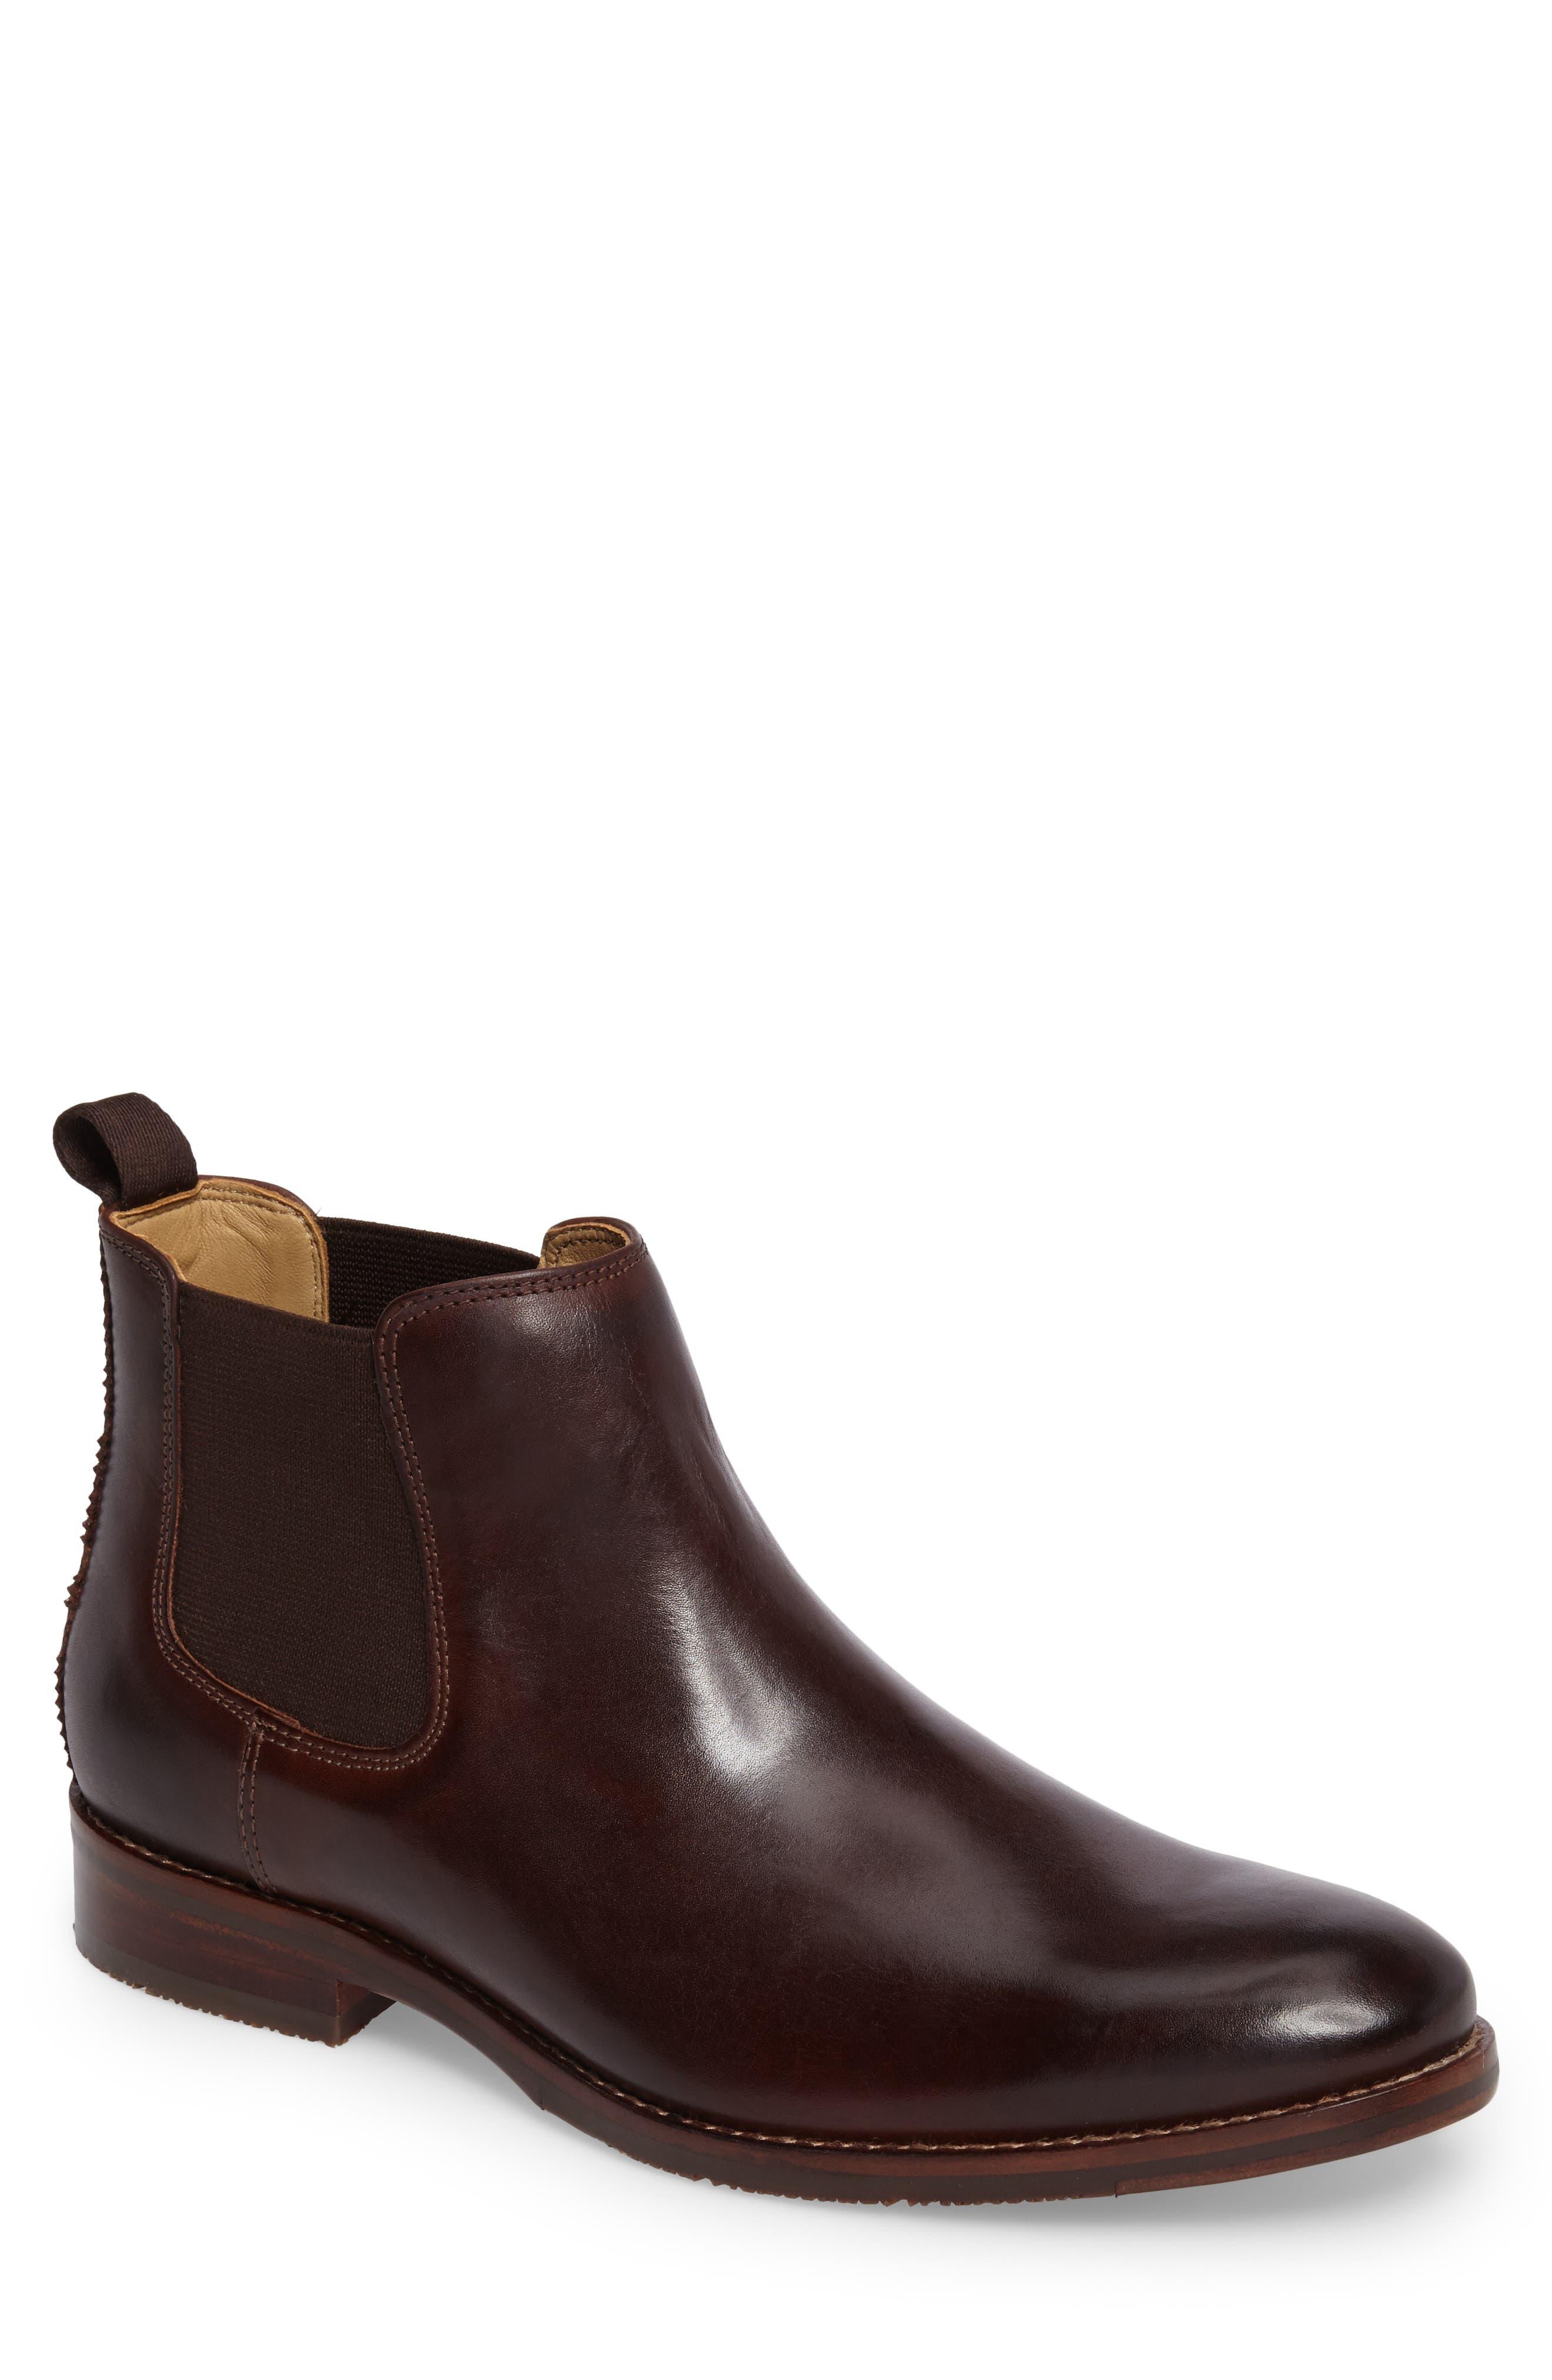 Garner Chelsea Boot,                             Main thumbnail 1, color,                             Mahogany Leather